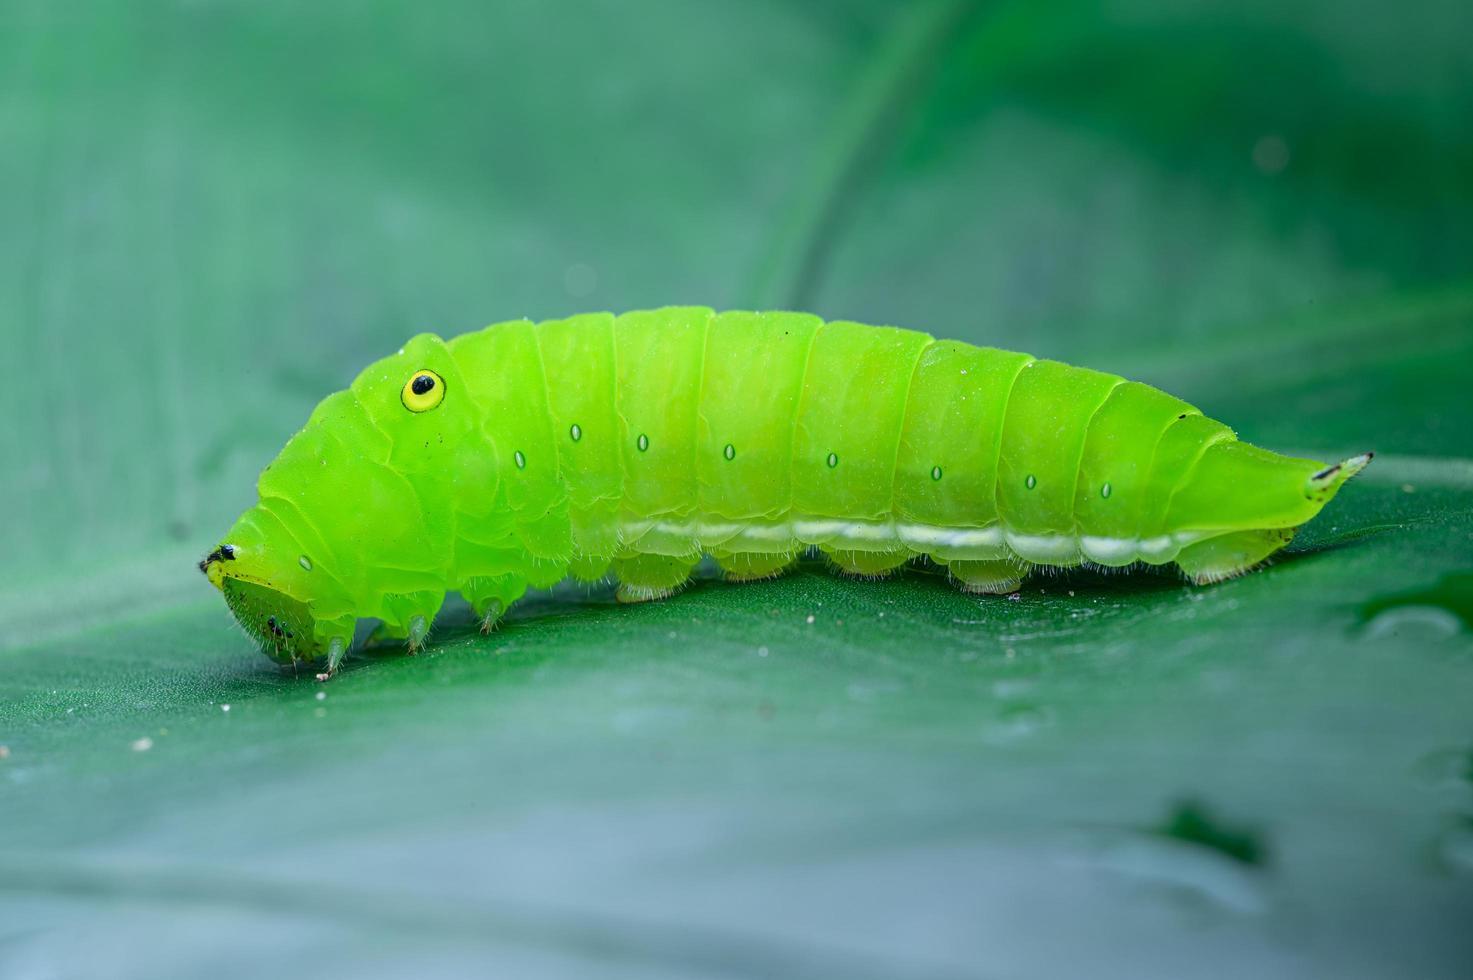 grüne Raupe auf dem Blatt foto